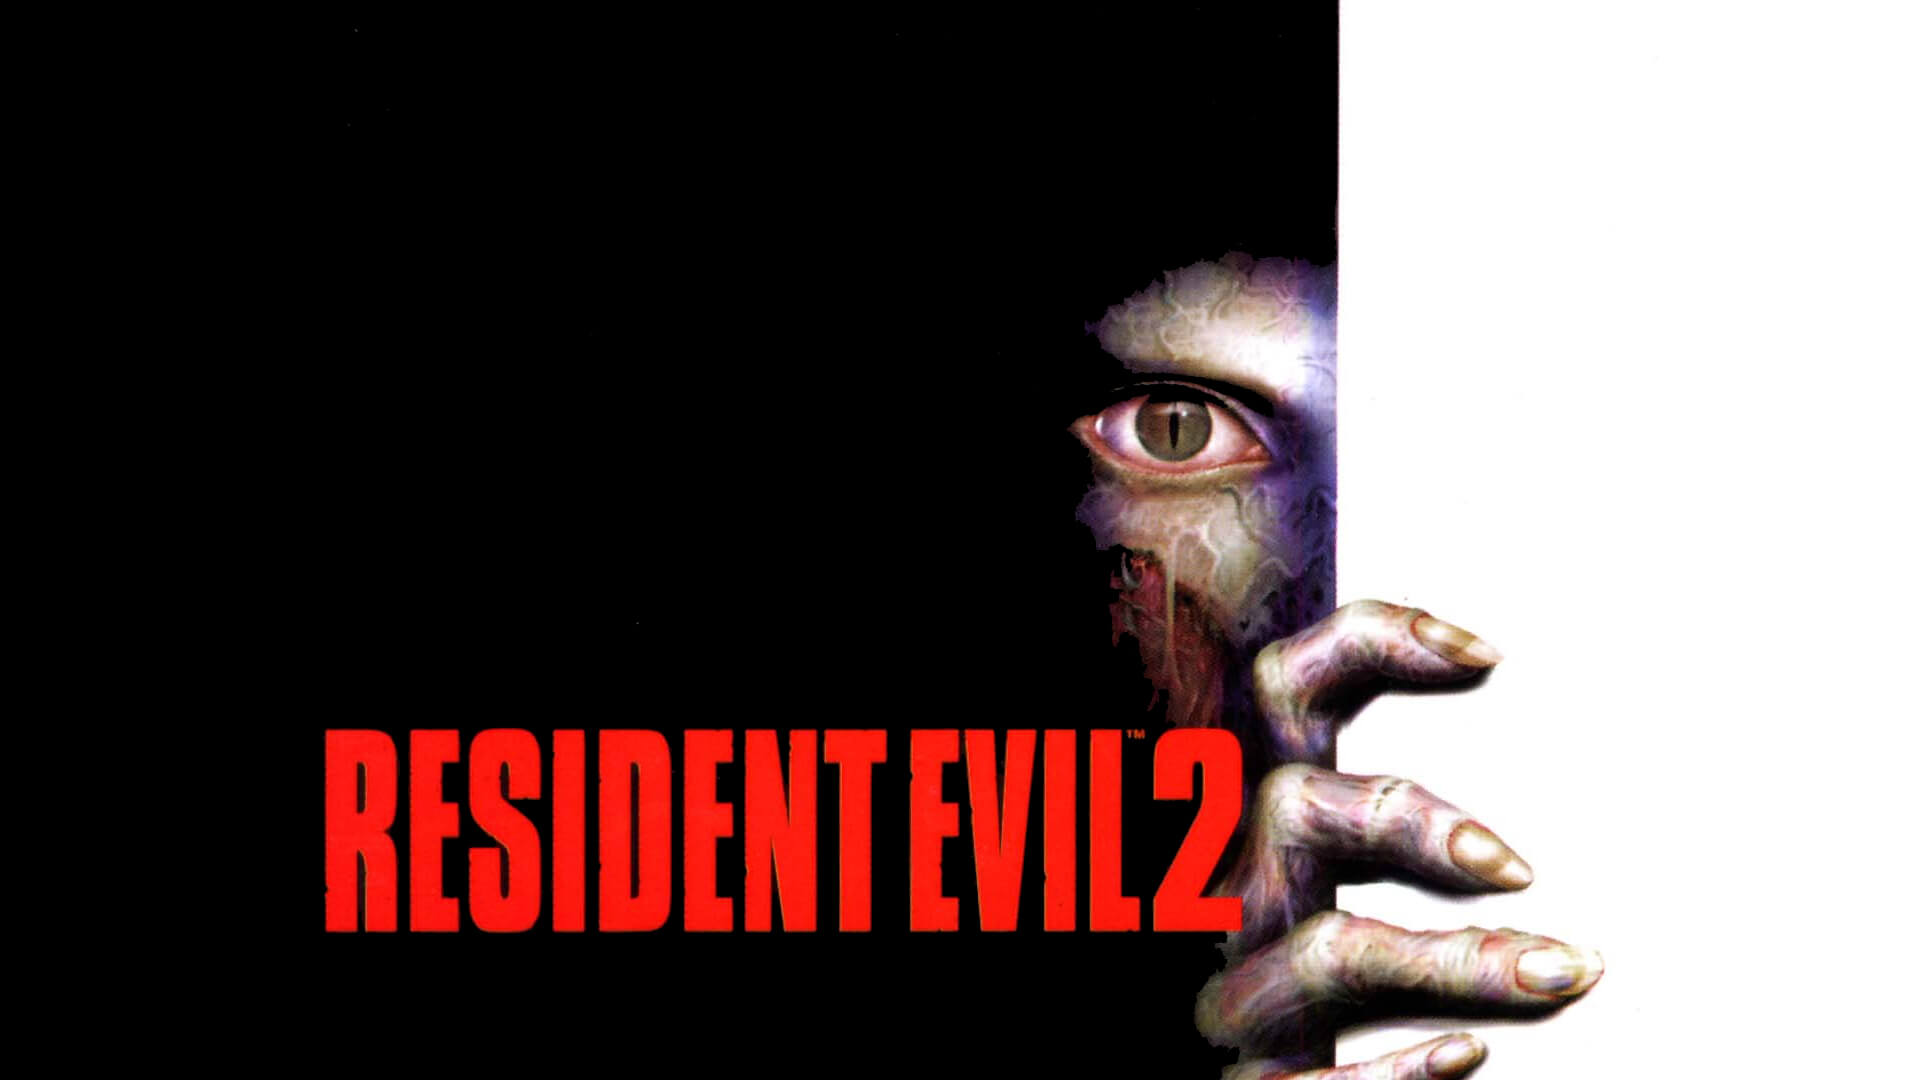 Resident Evil 2 Story Summary Spoilers